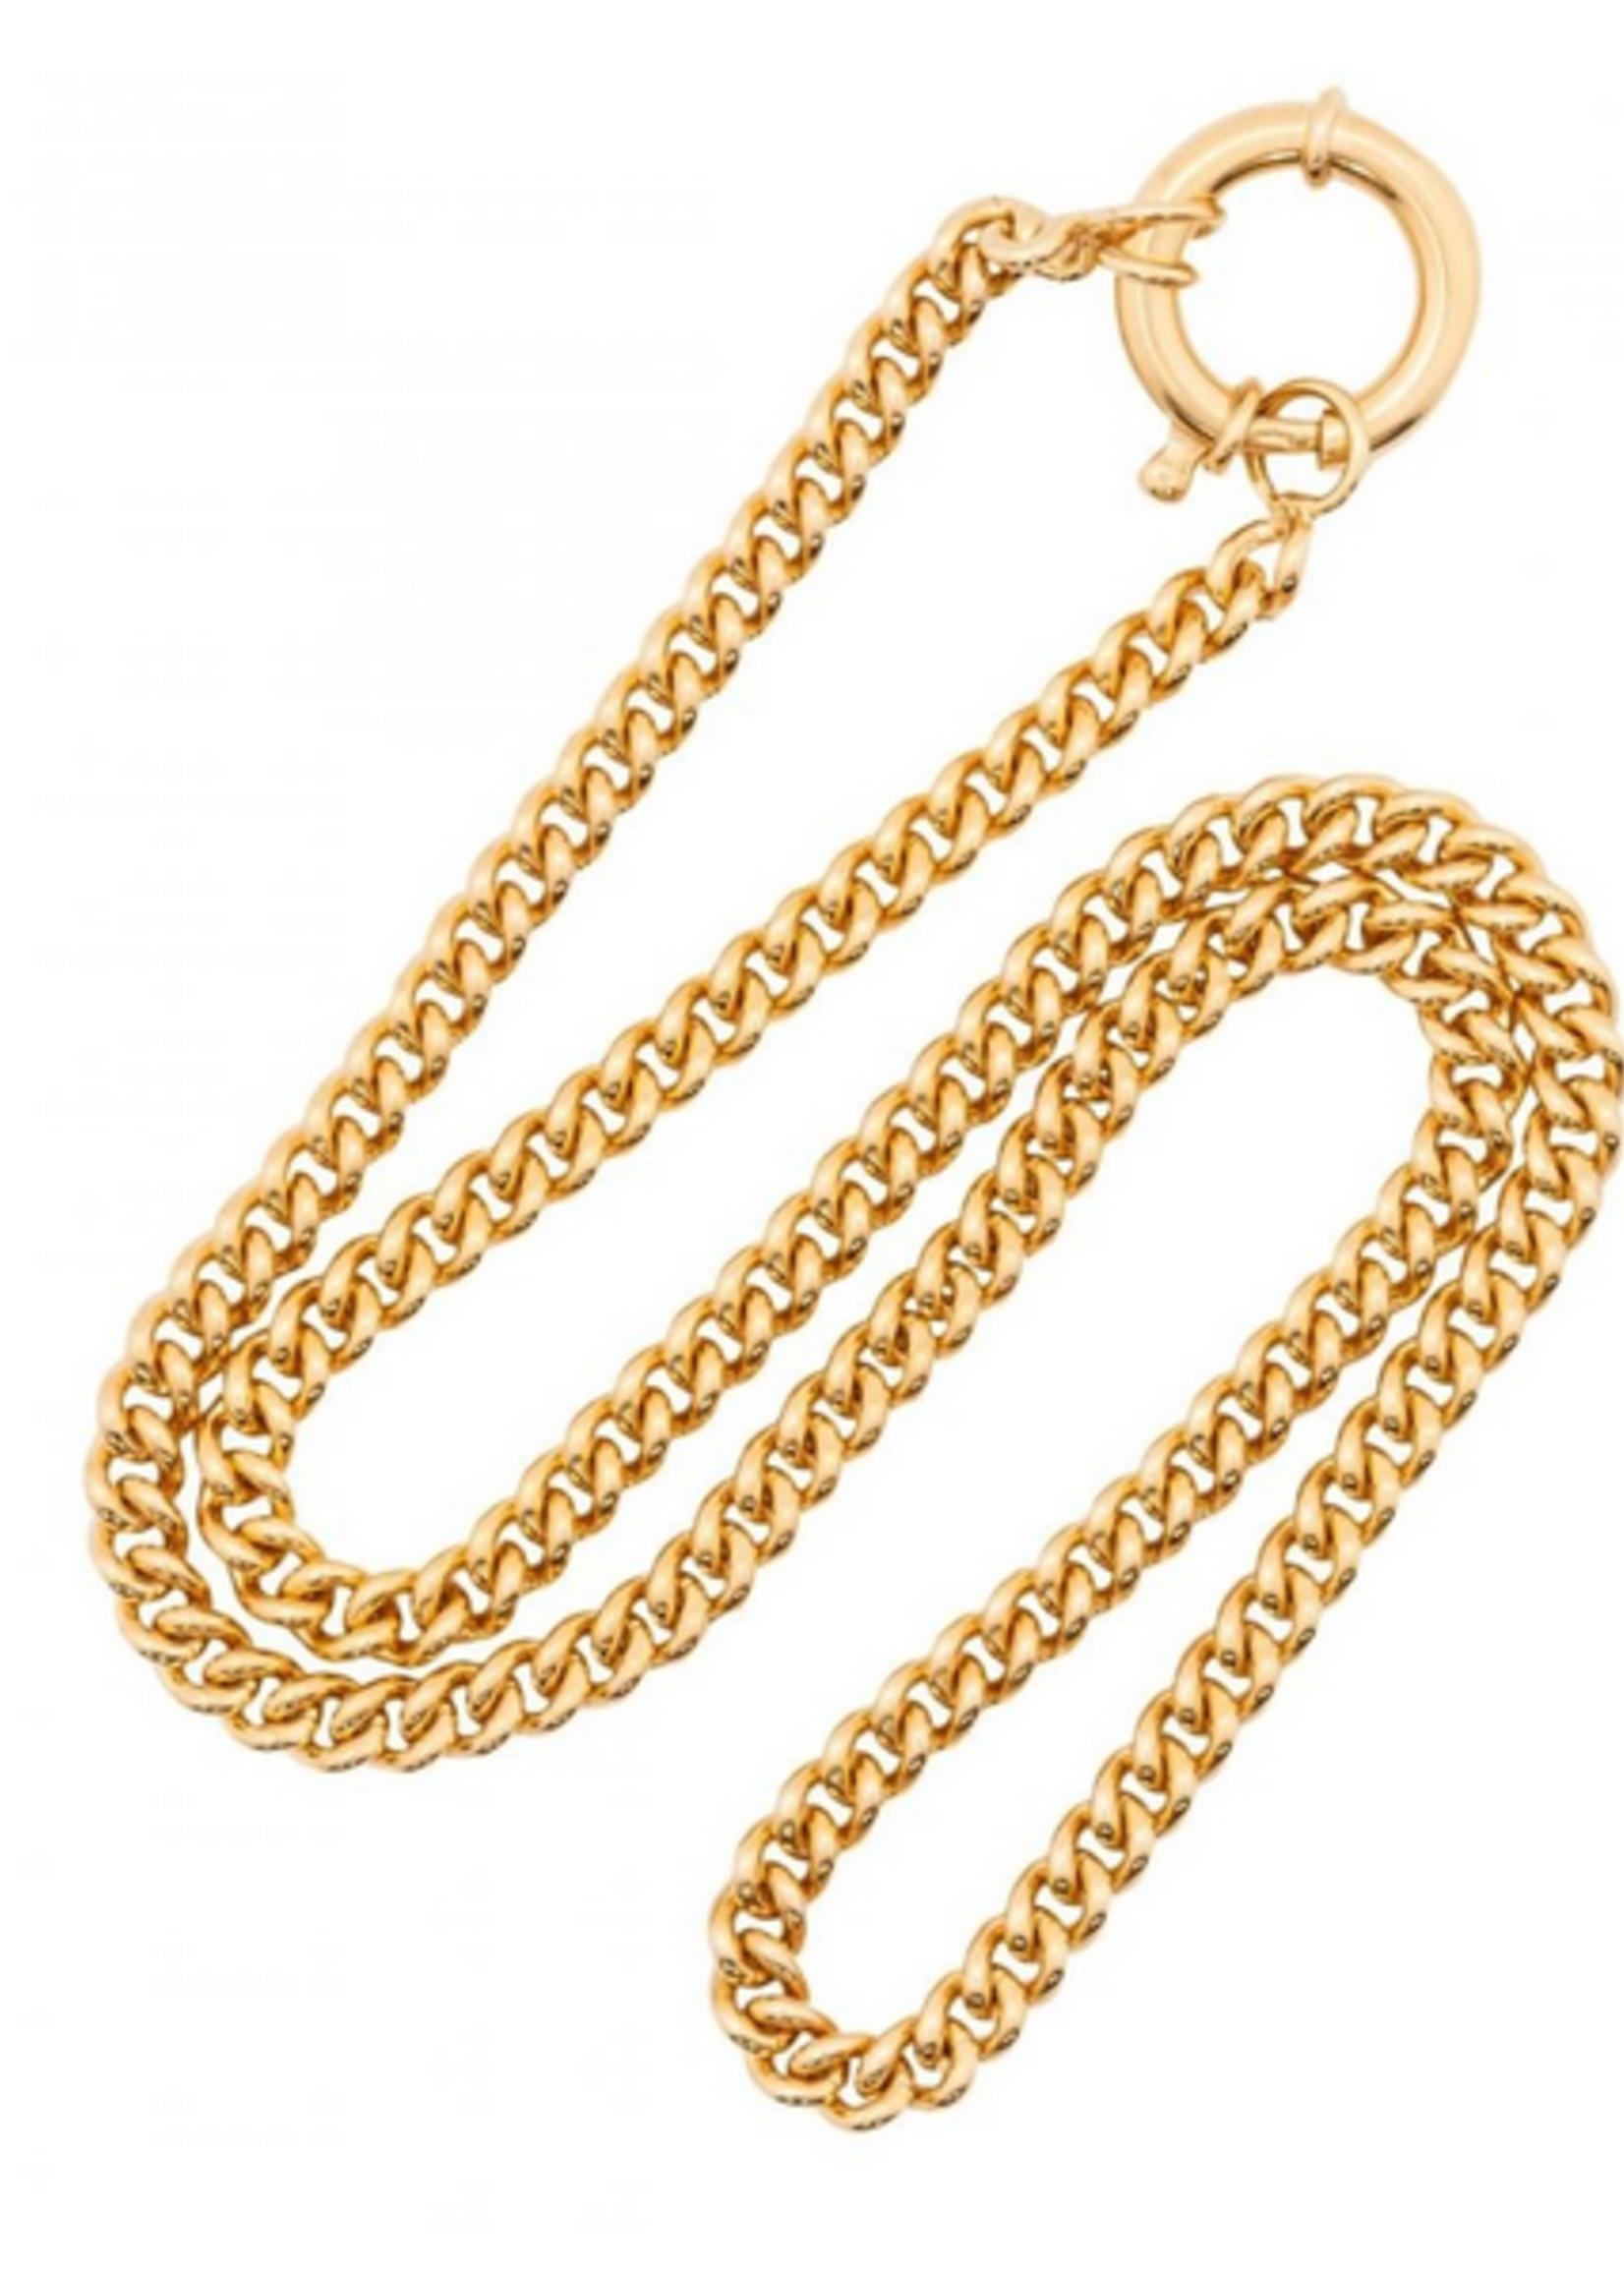 Fashionology Big Clasp Necklace